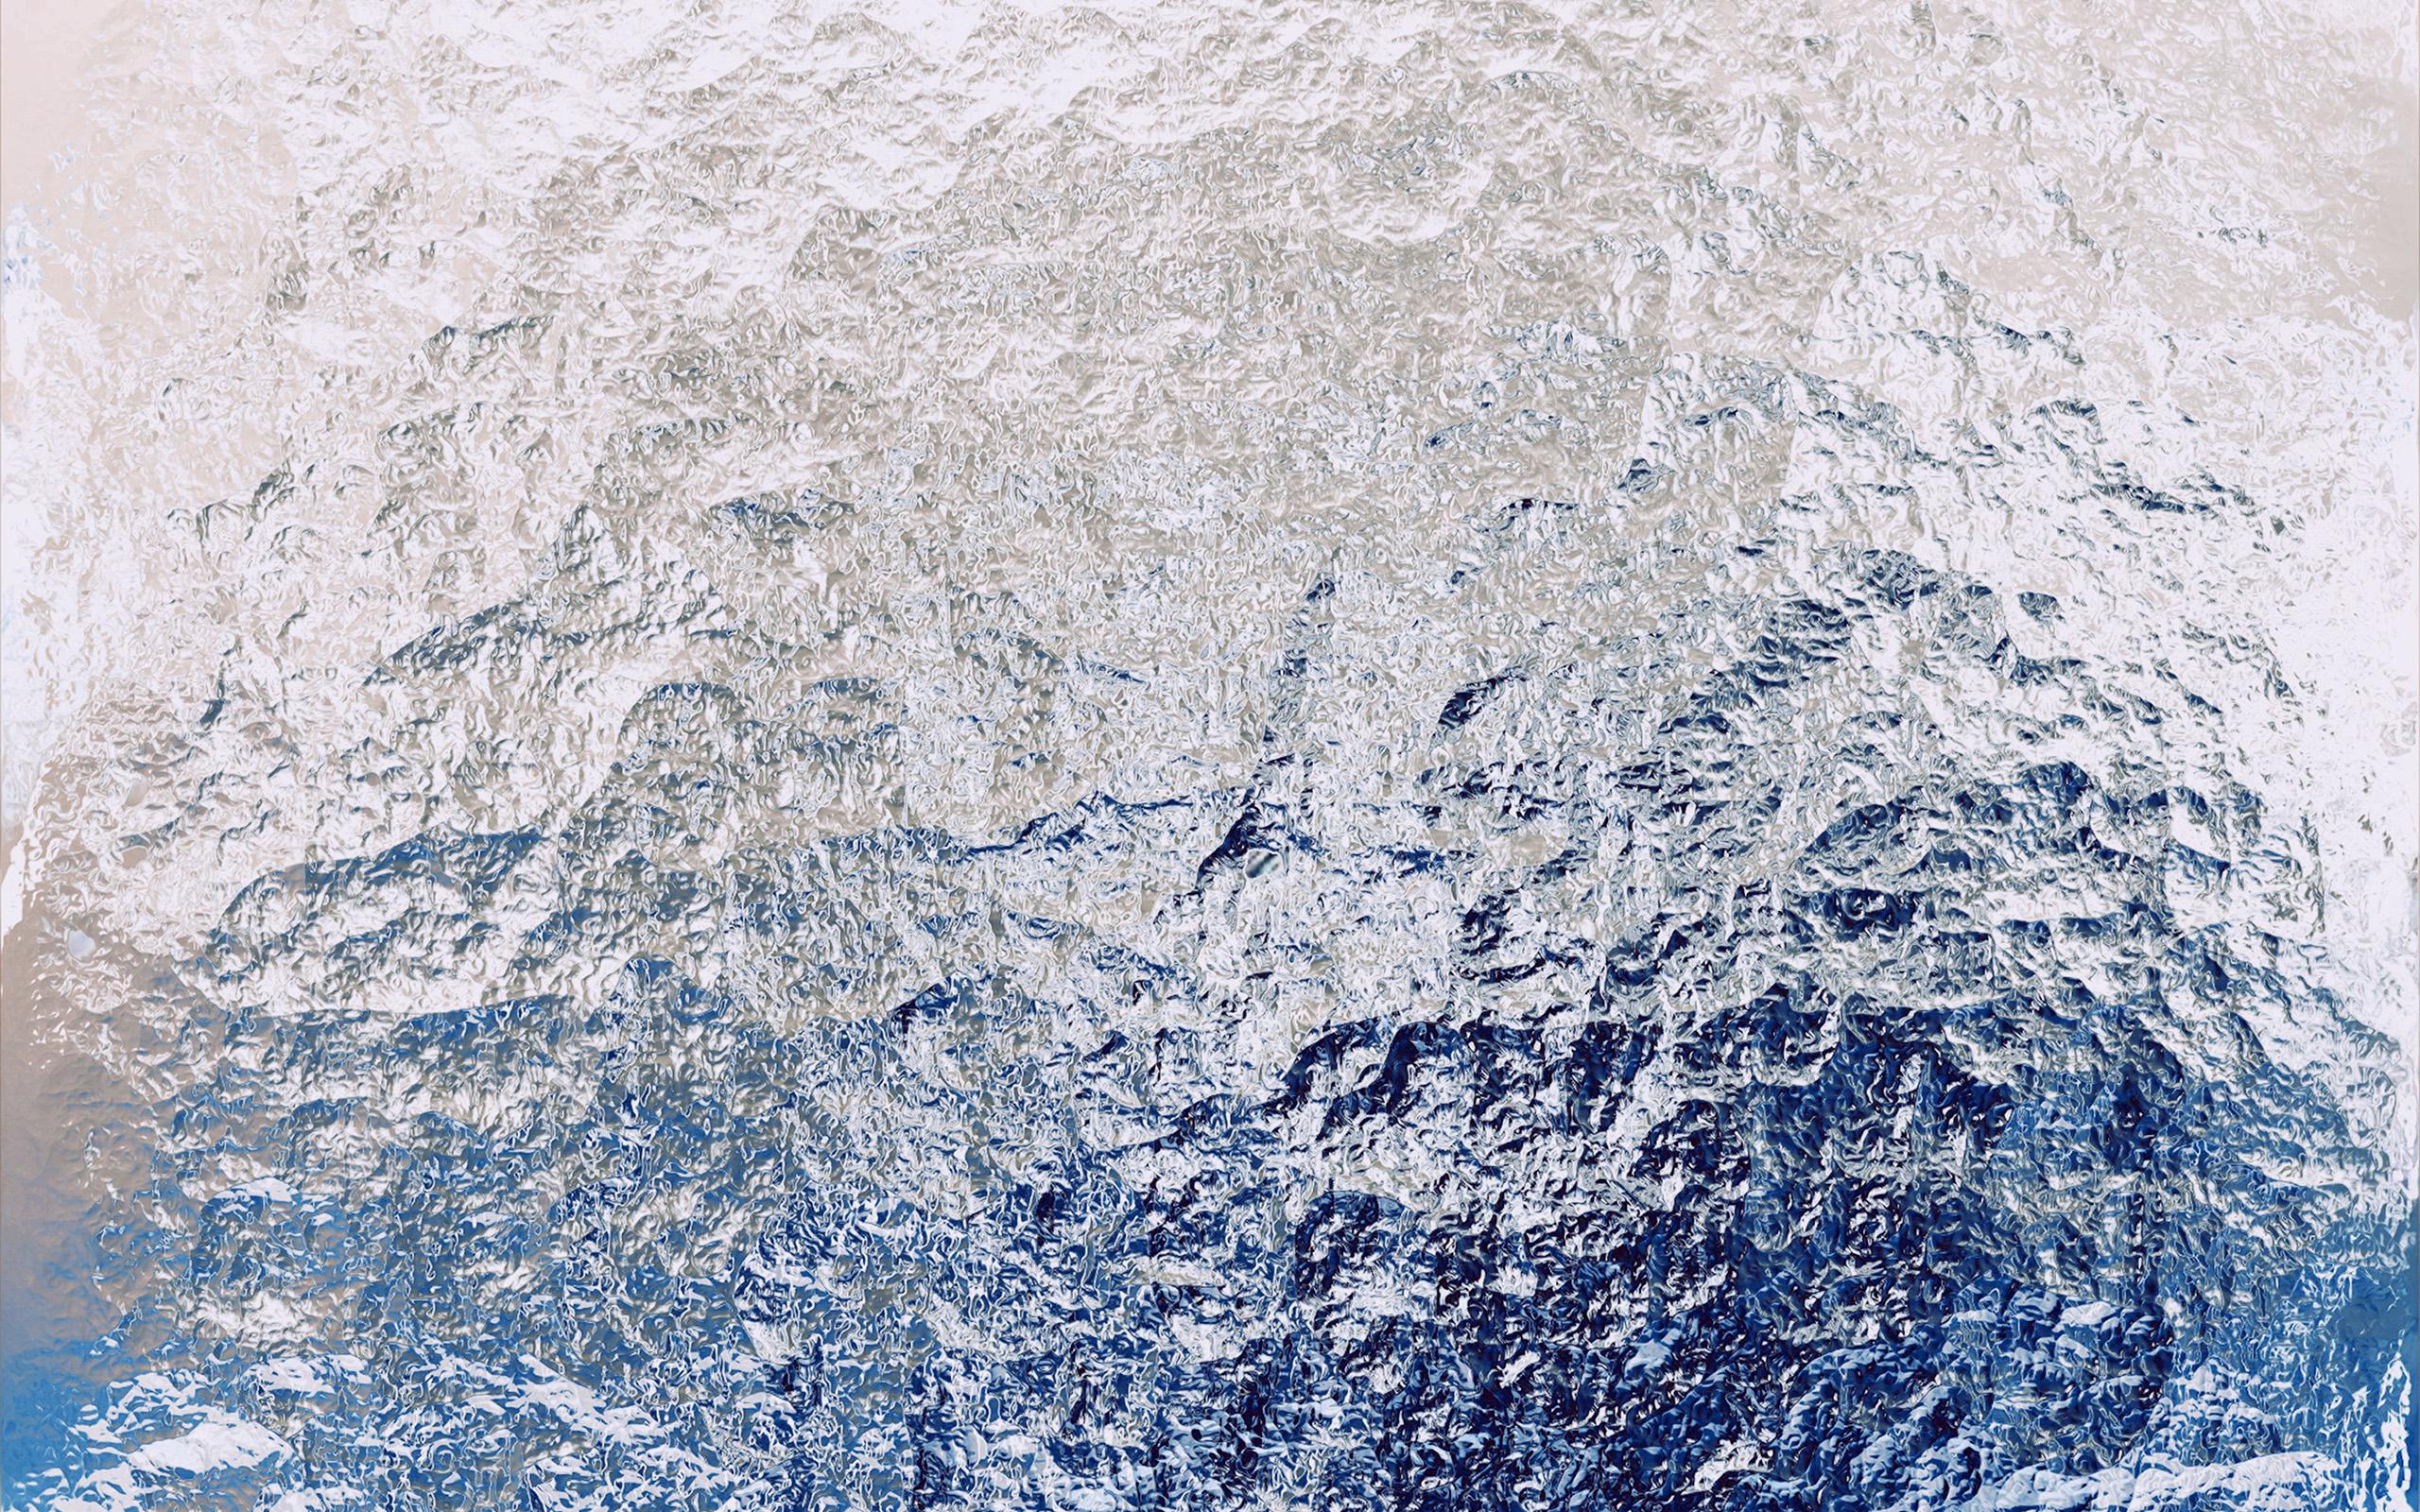 vs54 texture foil metal light dark pattern white wallpaper macbook 13 vs 15